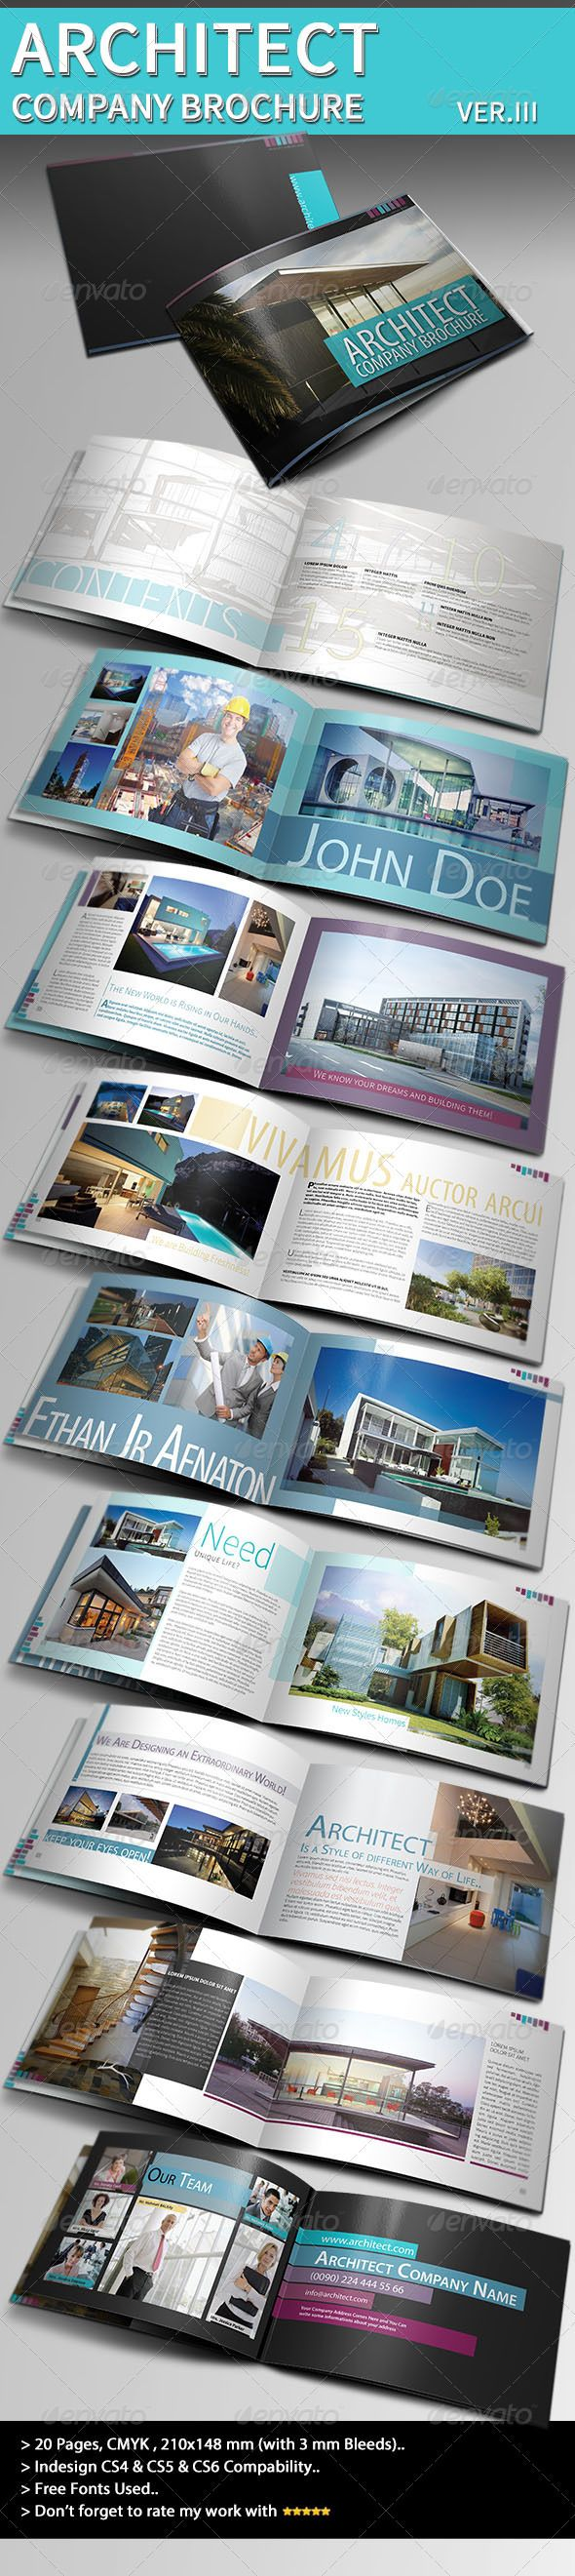 17 best ideas about architecture portfolio pdf on for Architecture brochure design pdf